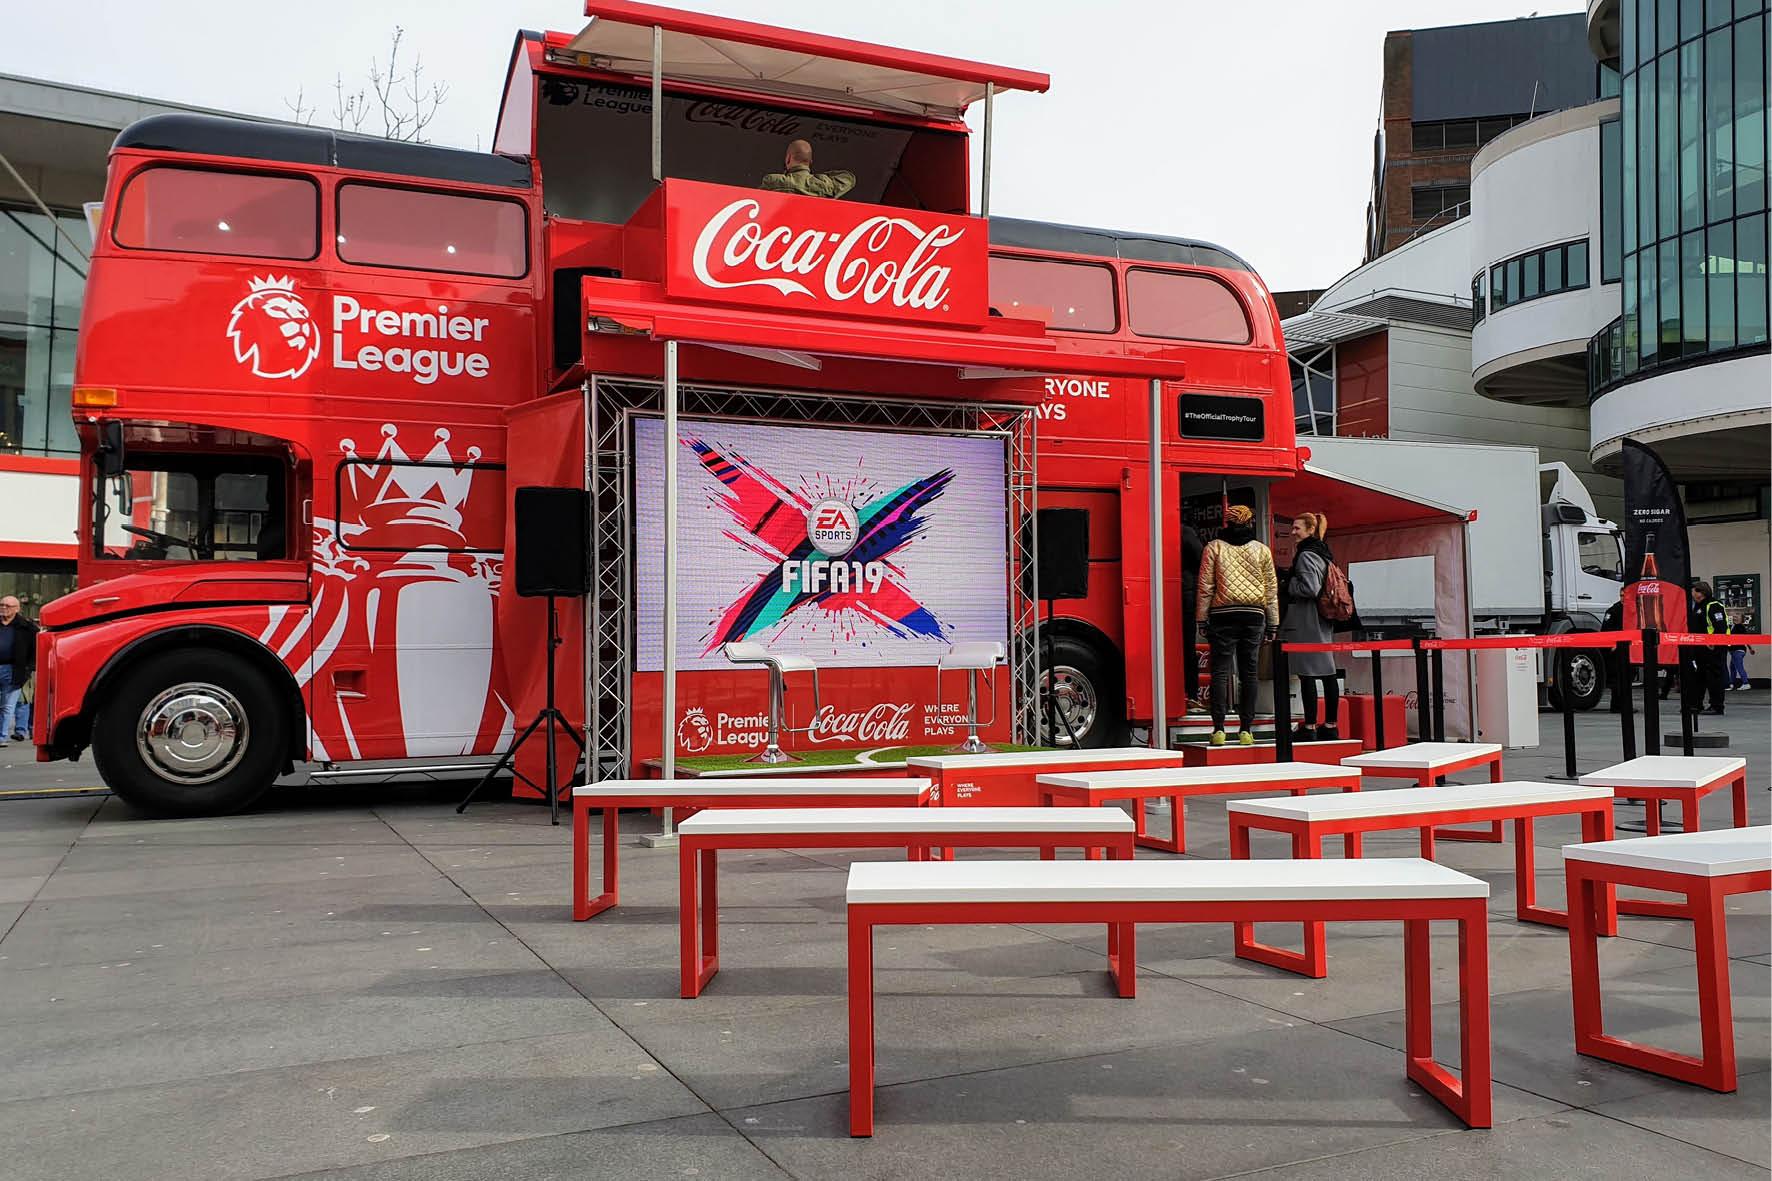 bus_business_2019_coca_cola_8.jpg